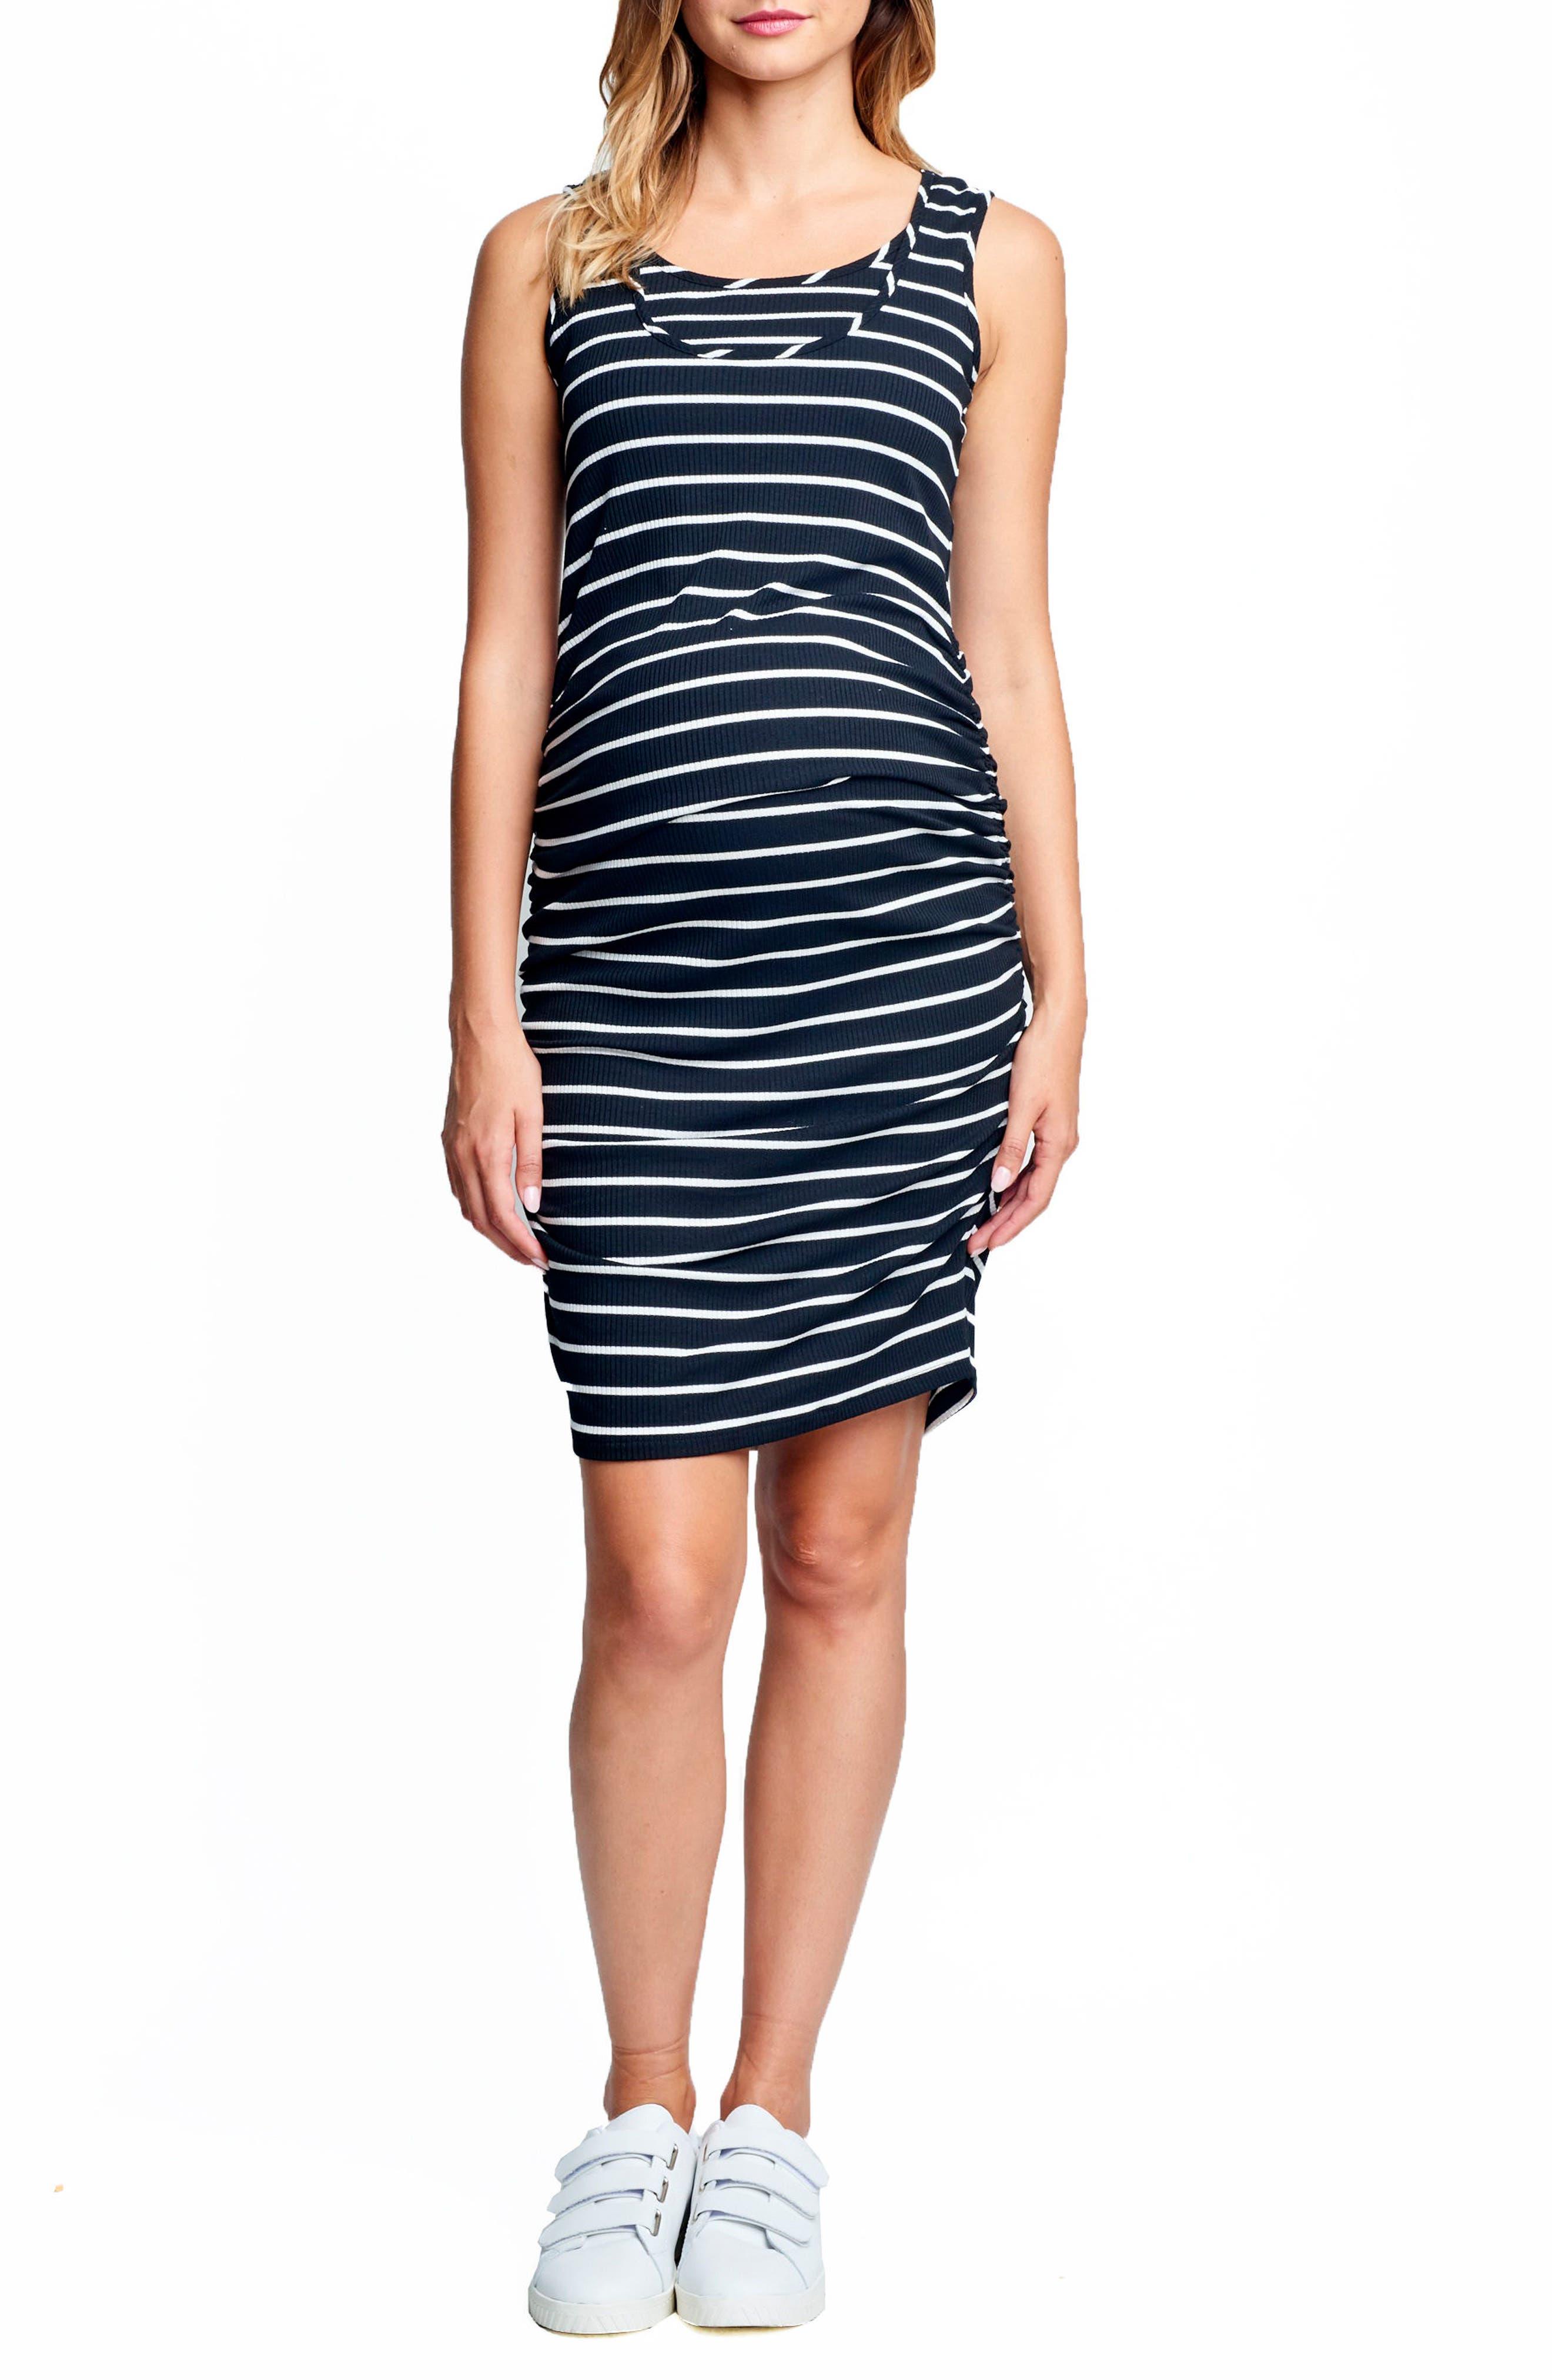 Ruched Maternity/Nursing Dress,                             Main thumbnail 1, color,                             BLACK/ WHITE STRIPE